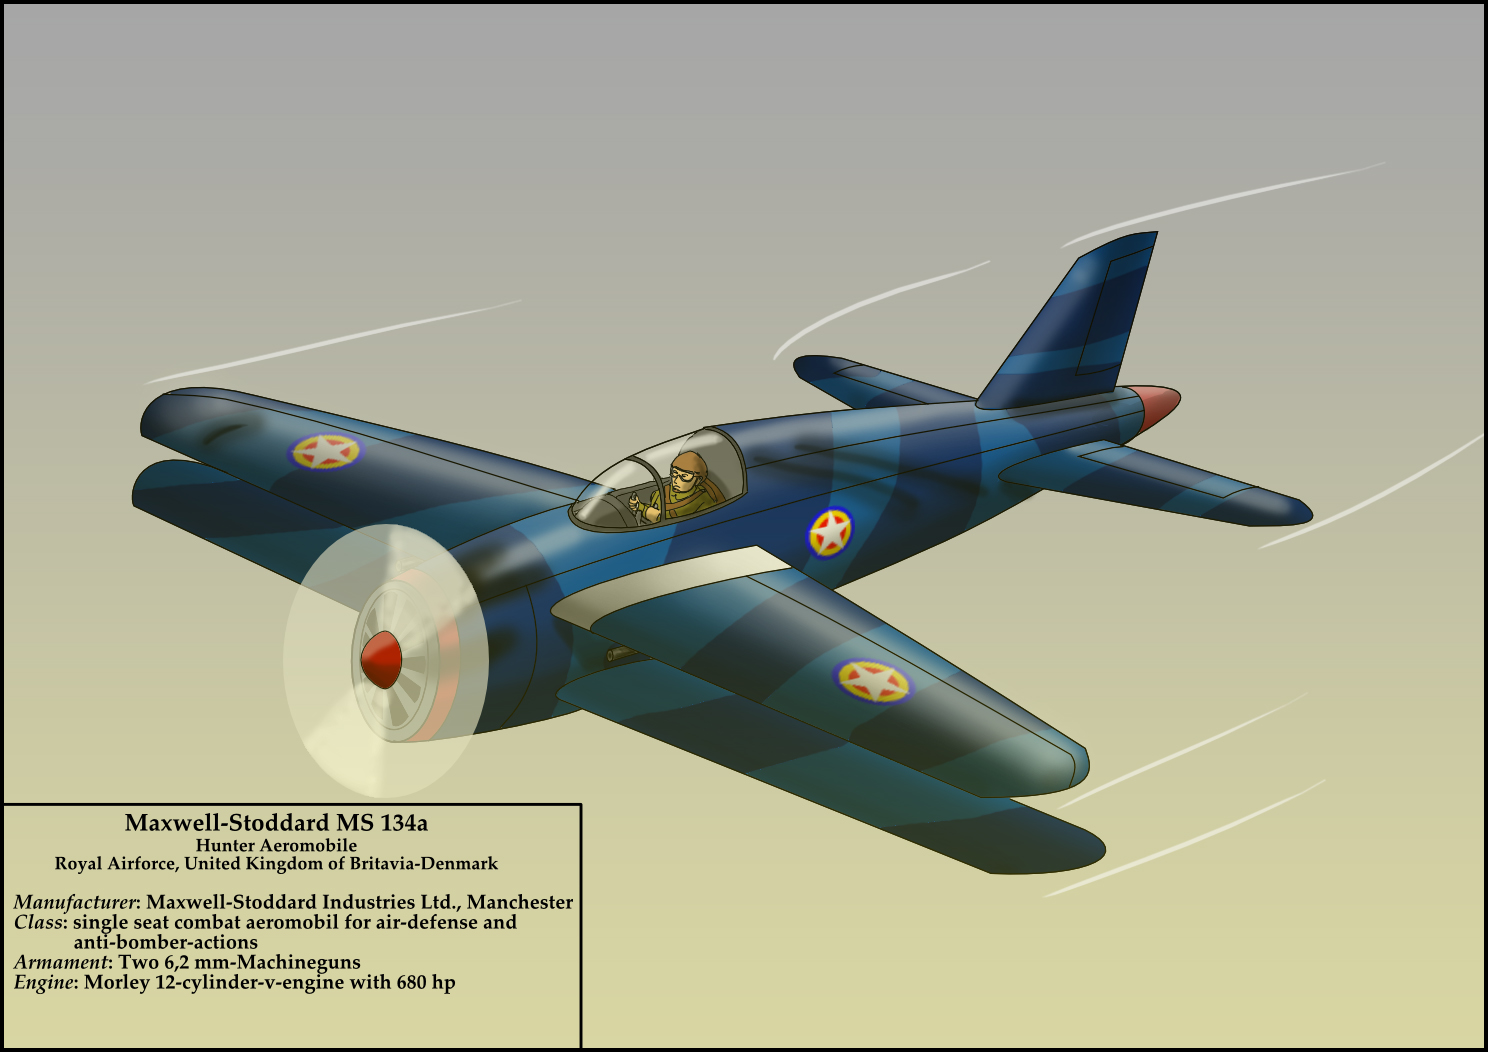 Maxwell Stoddard MS 134a